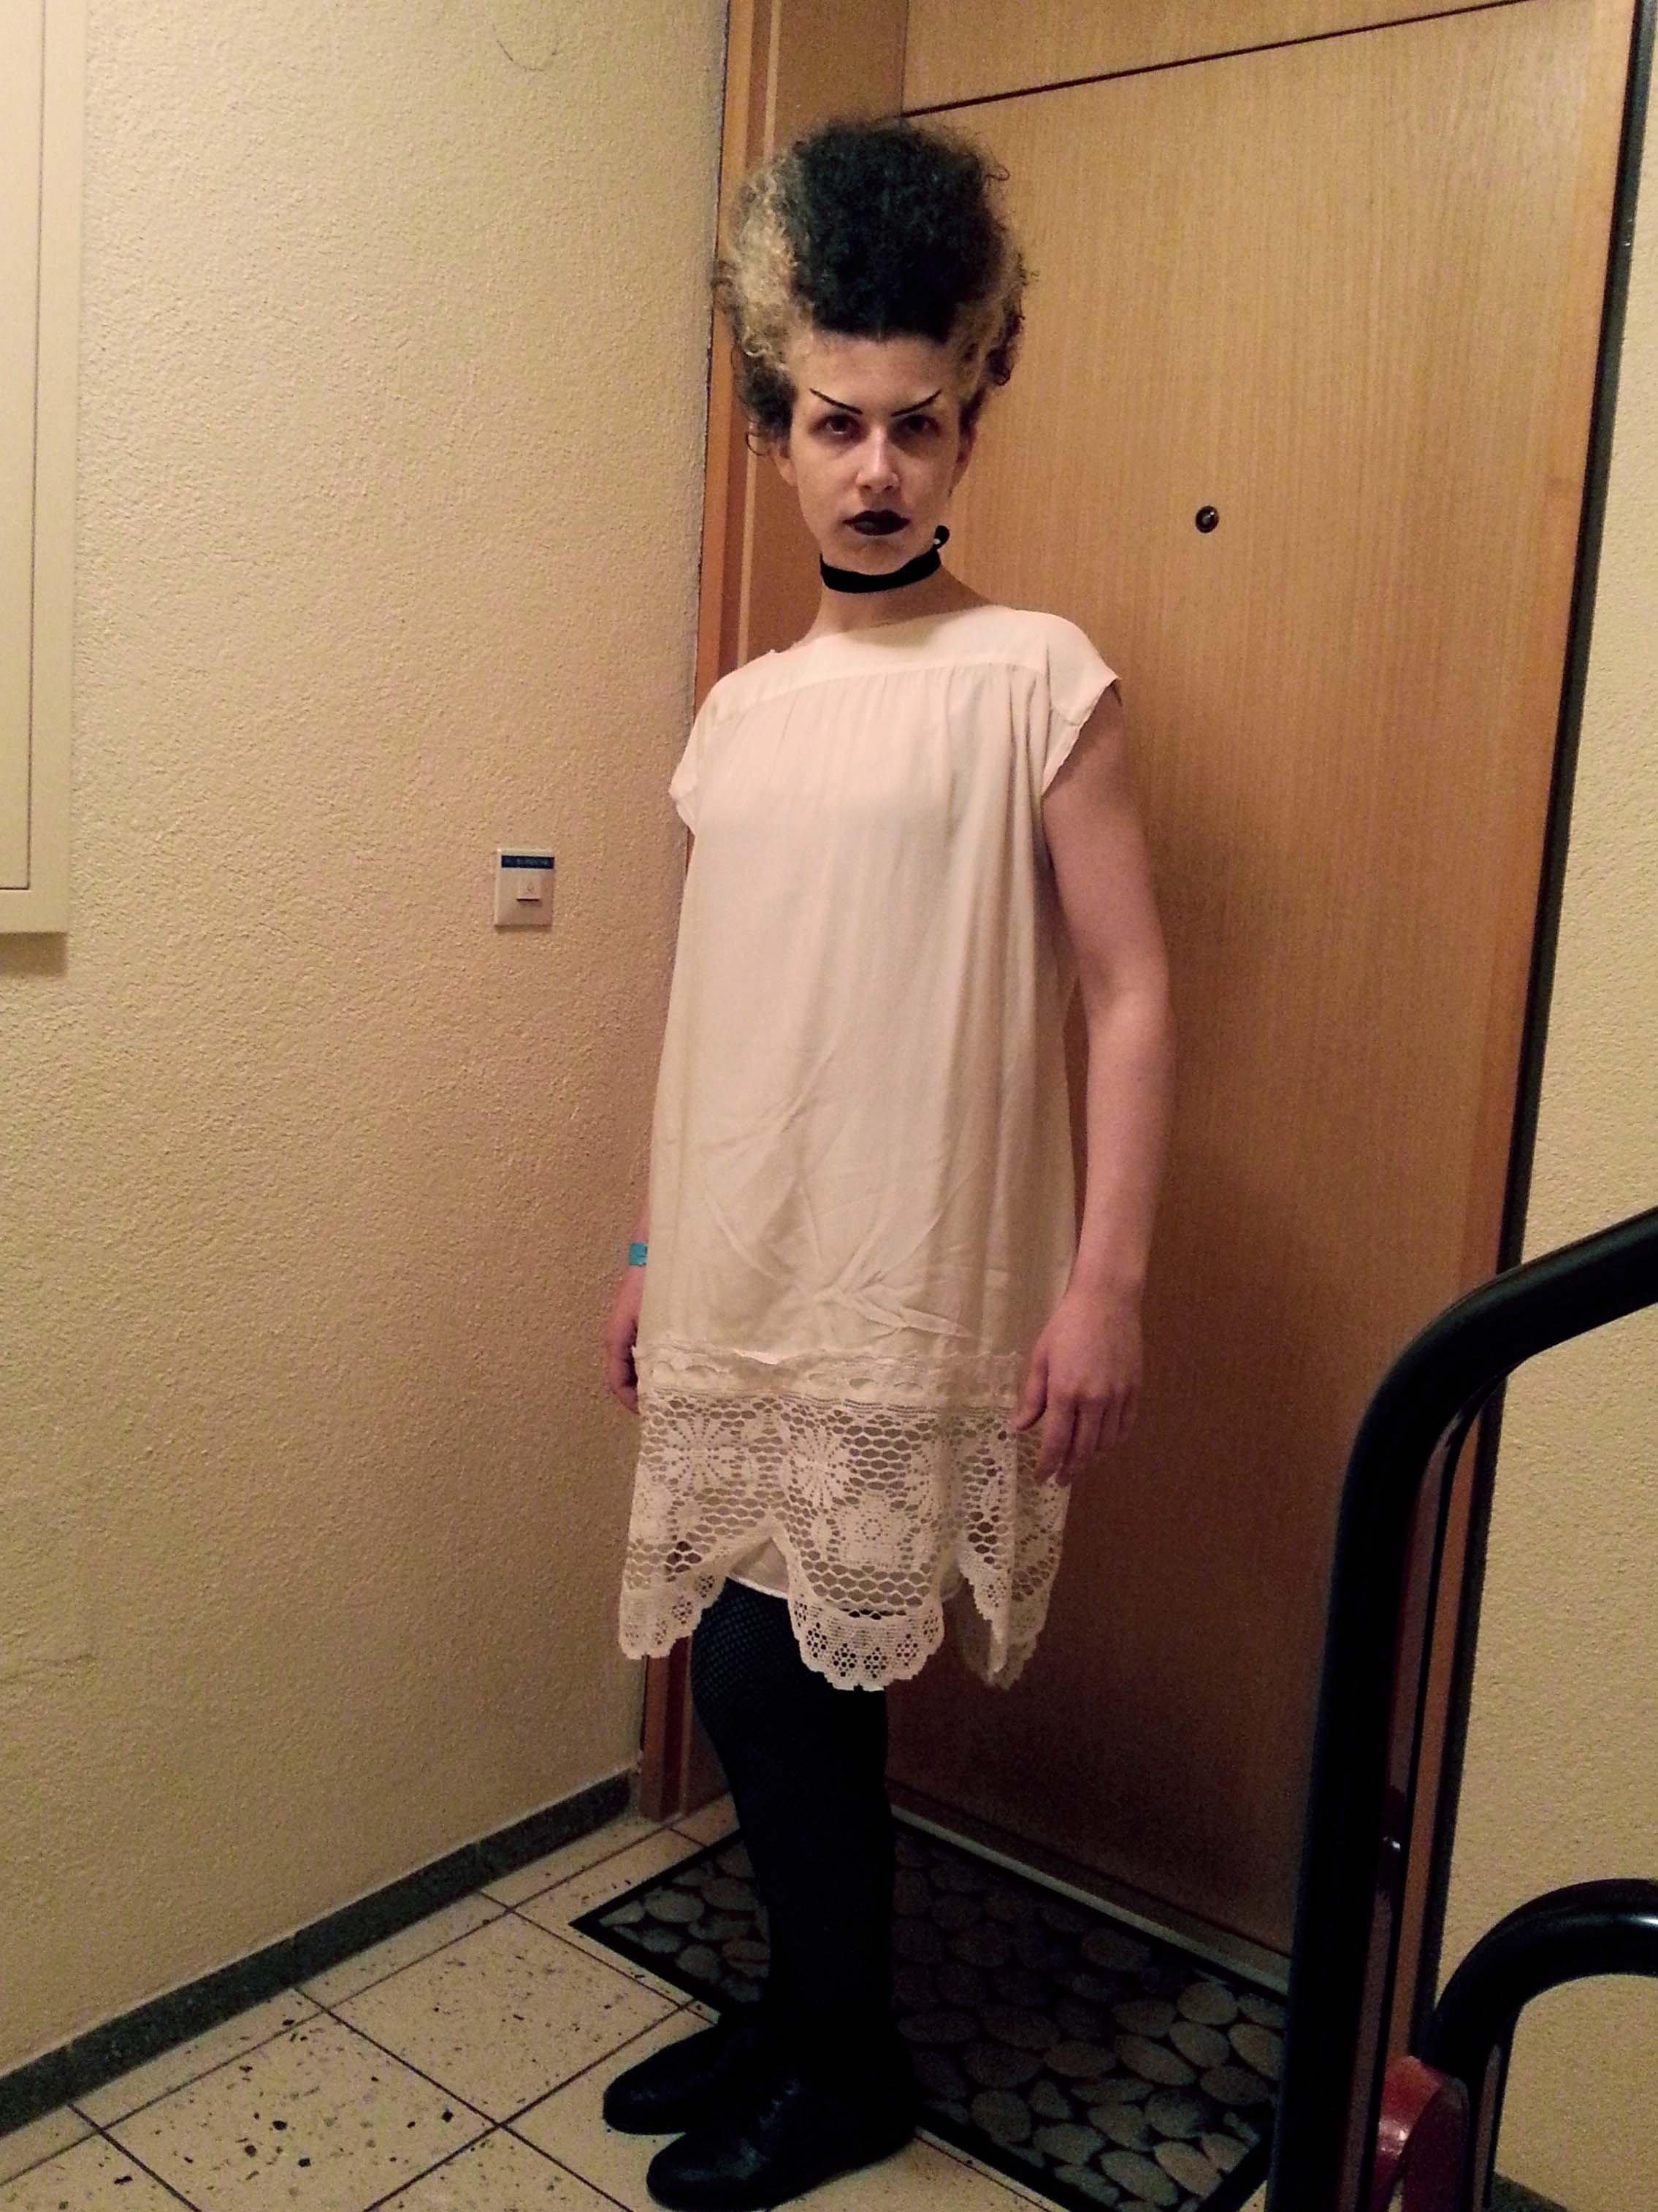 10 Perfect Bride Of Frankenstein Costume Ideas bride of frankenstein costume button snap 2021